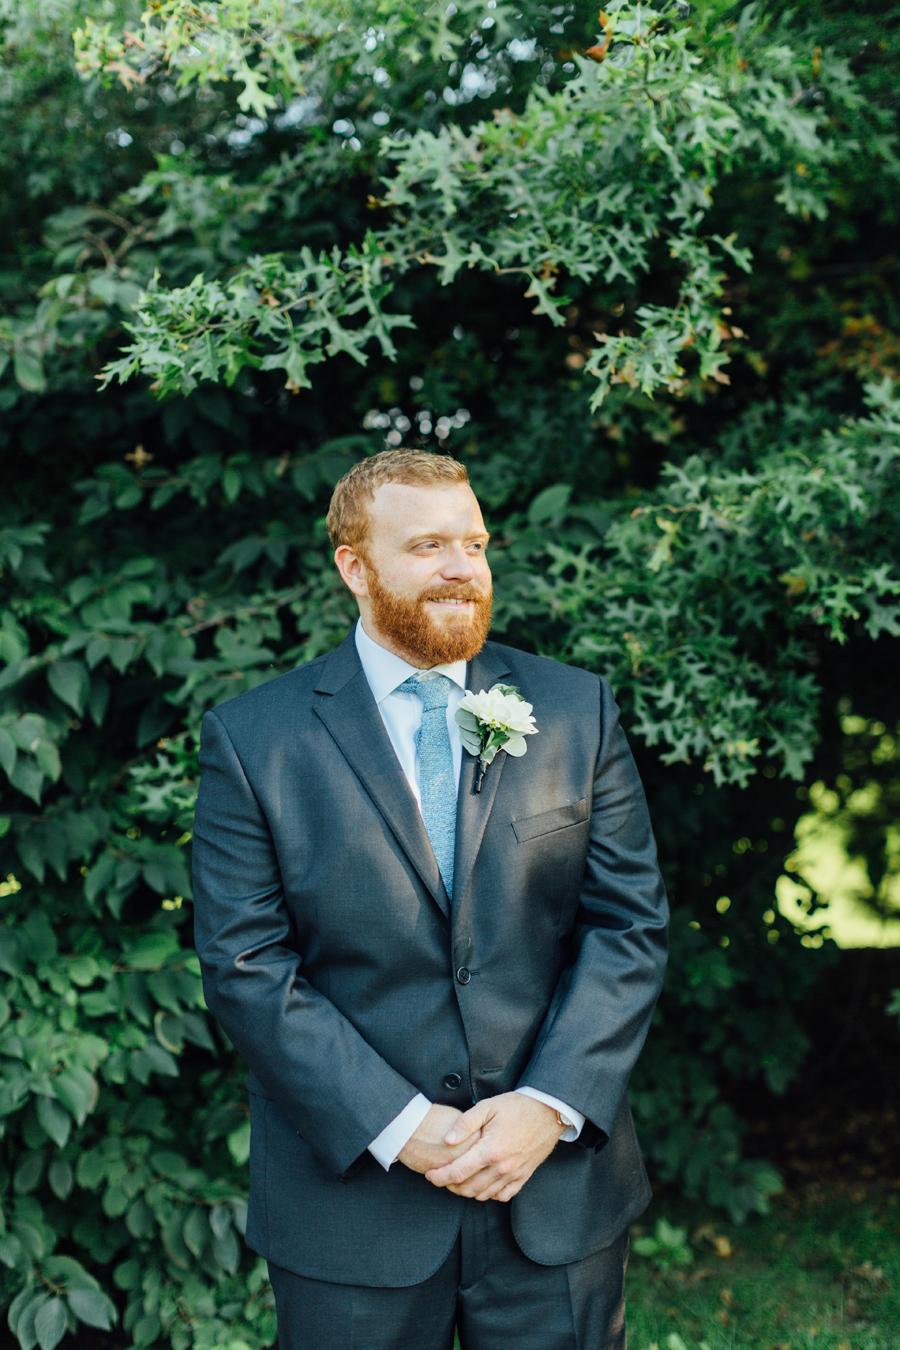 the-inn-at-leola-wedding-lancaster-pennsylvania-wedding-photographer-rebeka-viola-photograhy (47).jpg